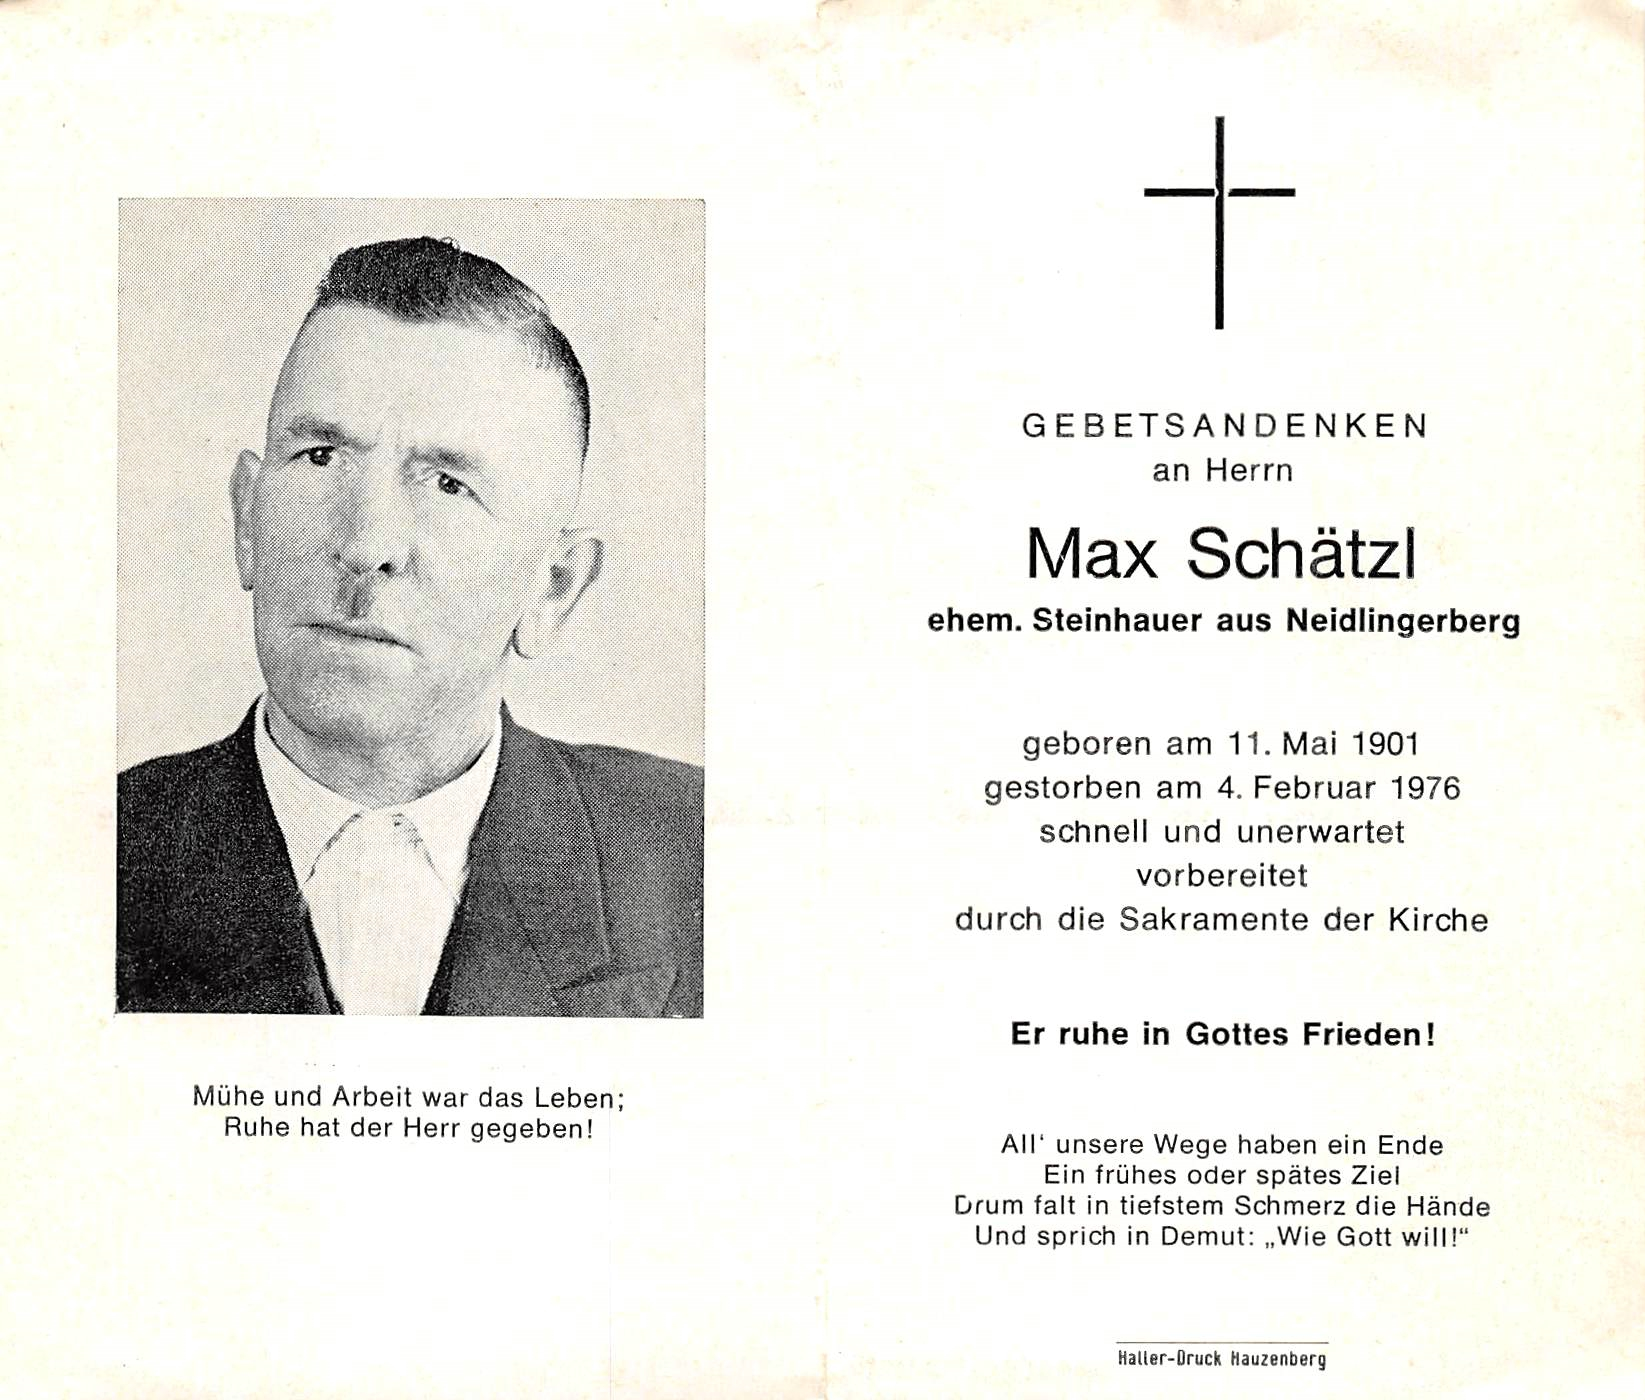 1976-02-04-Schätzl-Max-Neidlingerberg-ehem.-Steinhauer